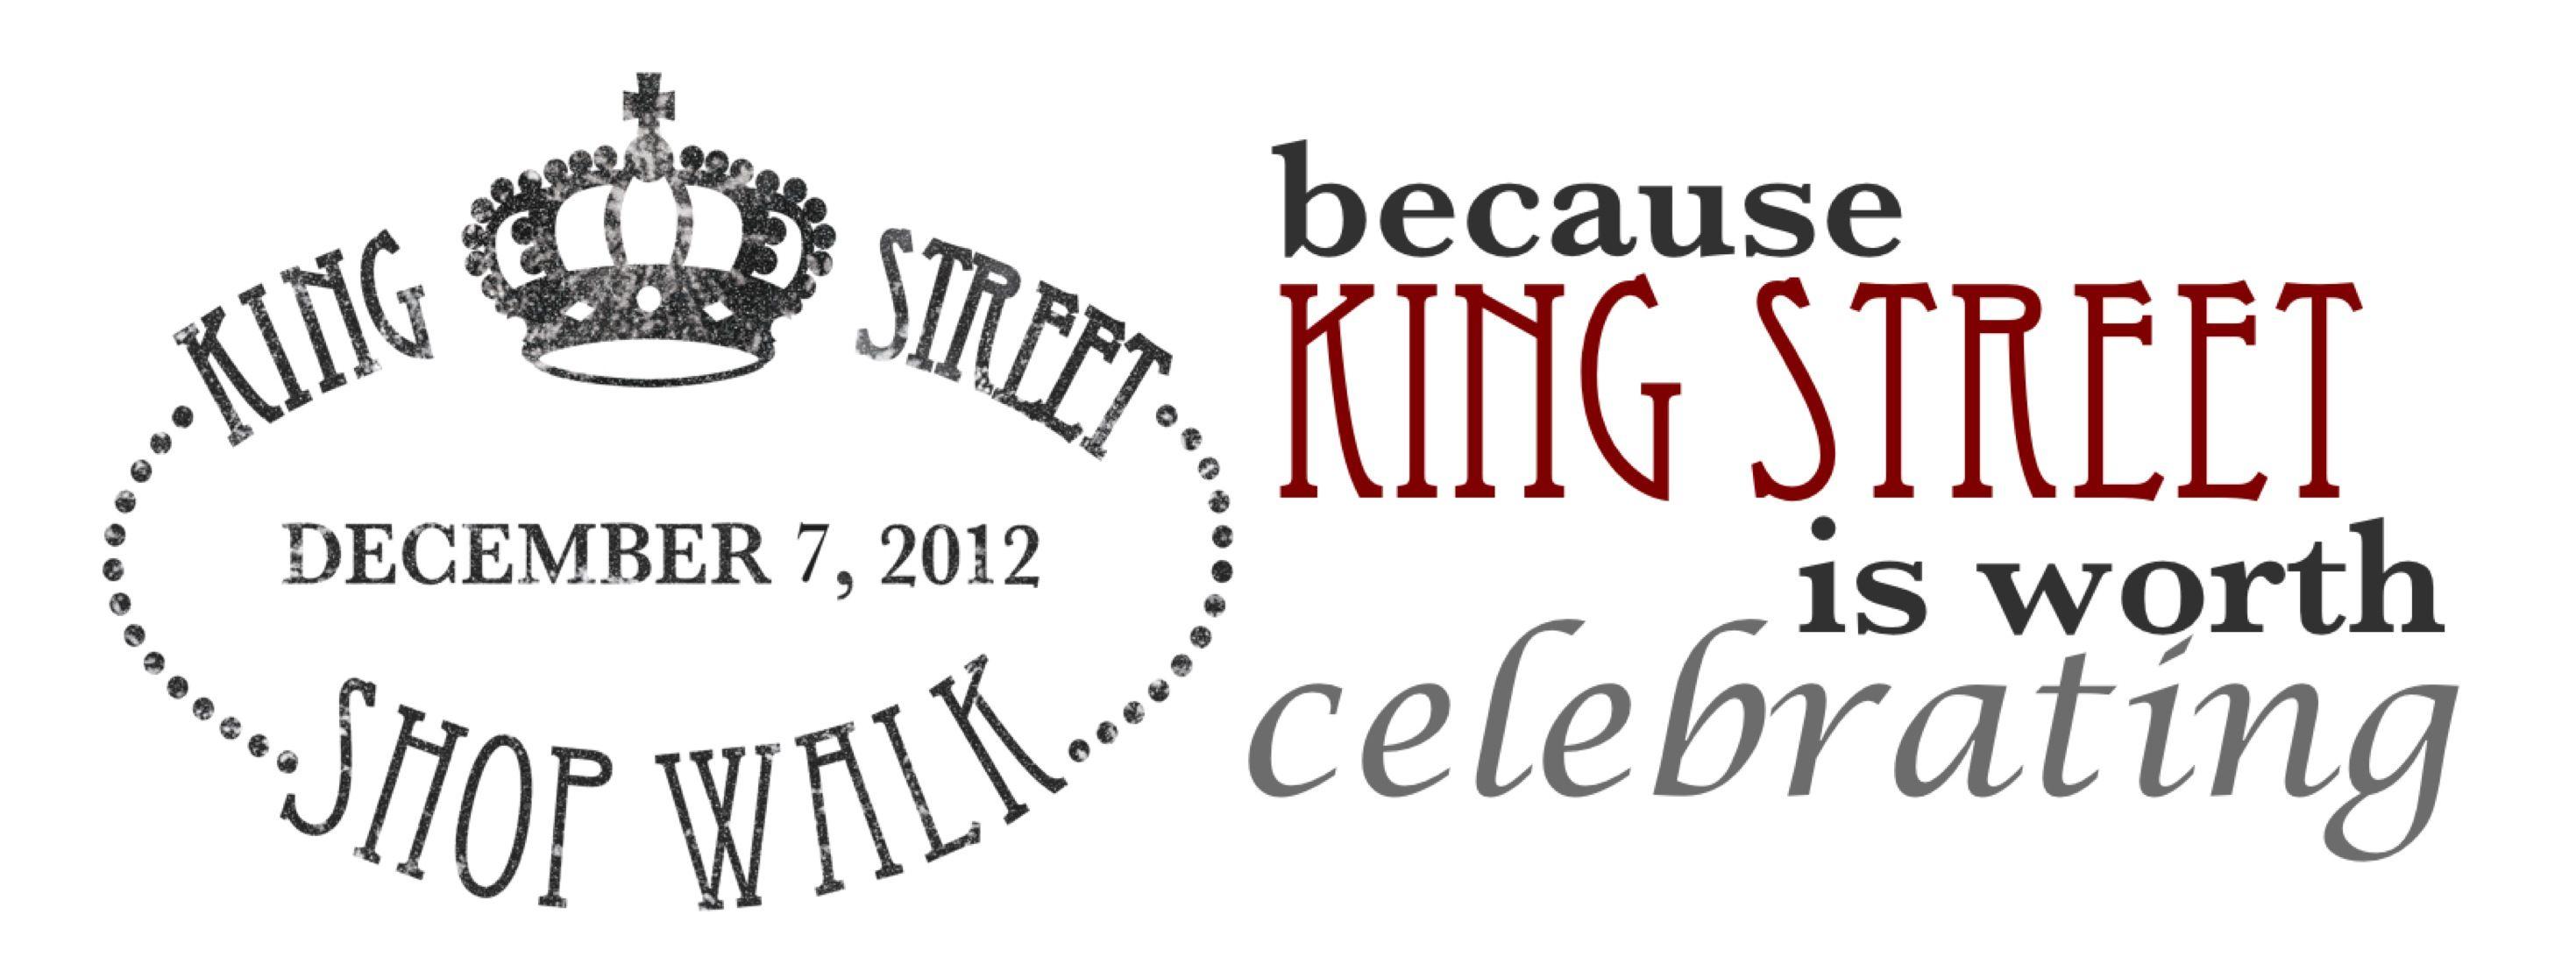 King Street Shop Walk! chs Street, Shopping, King